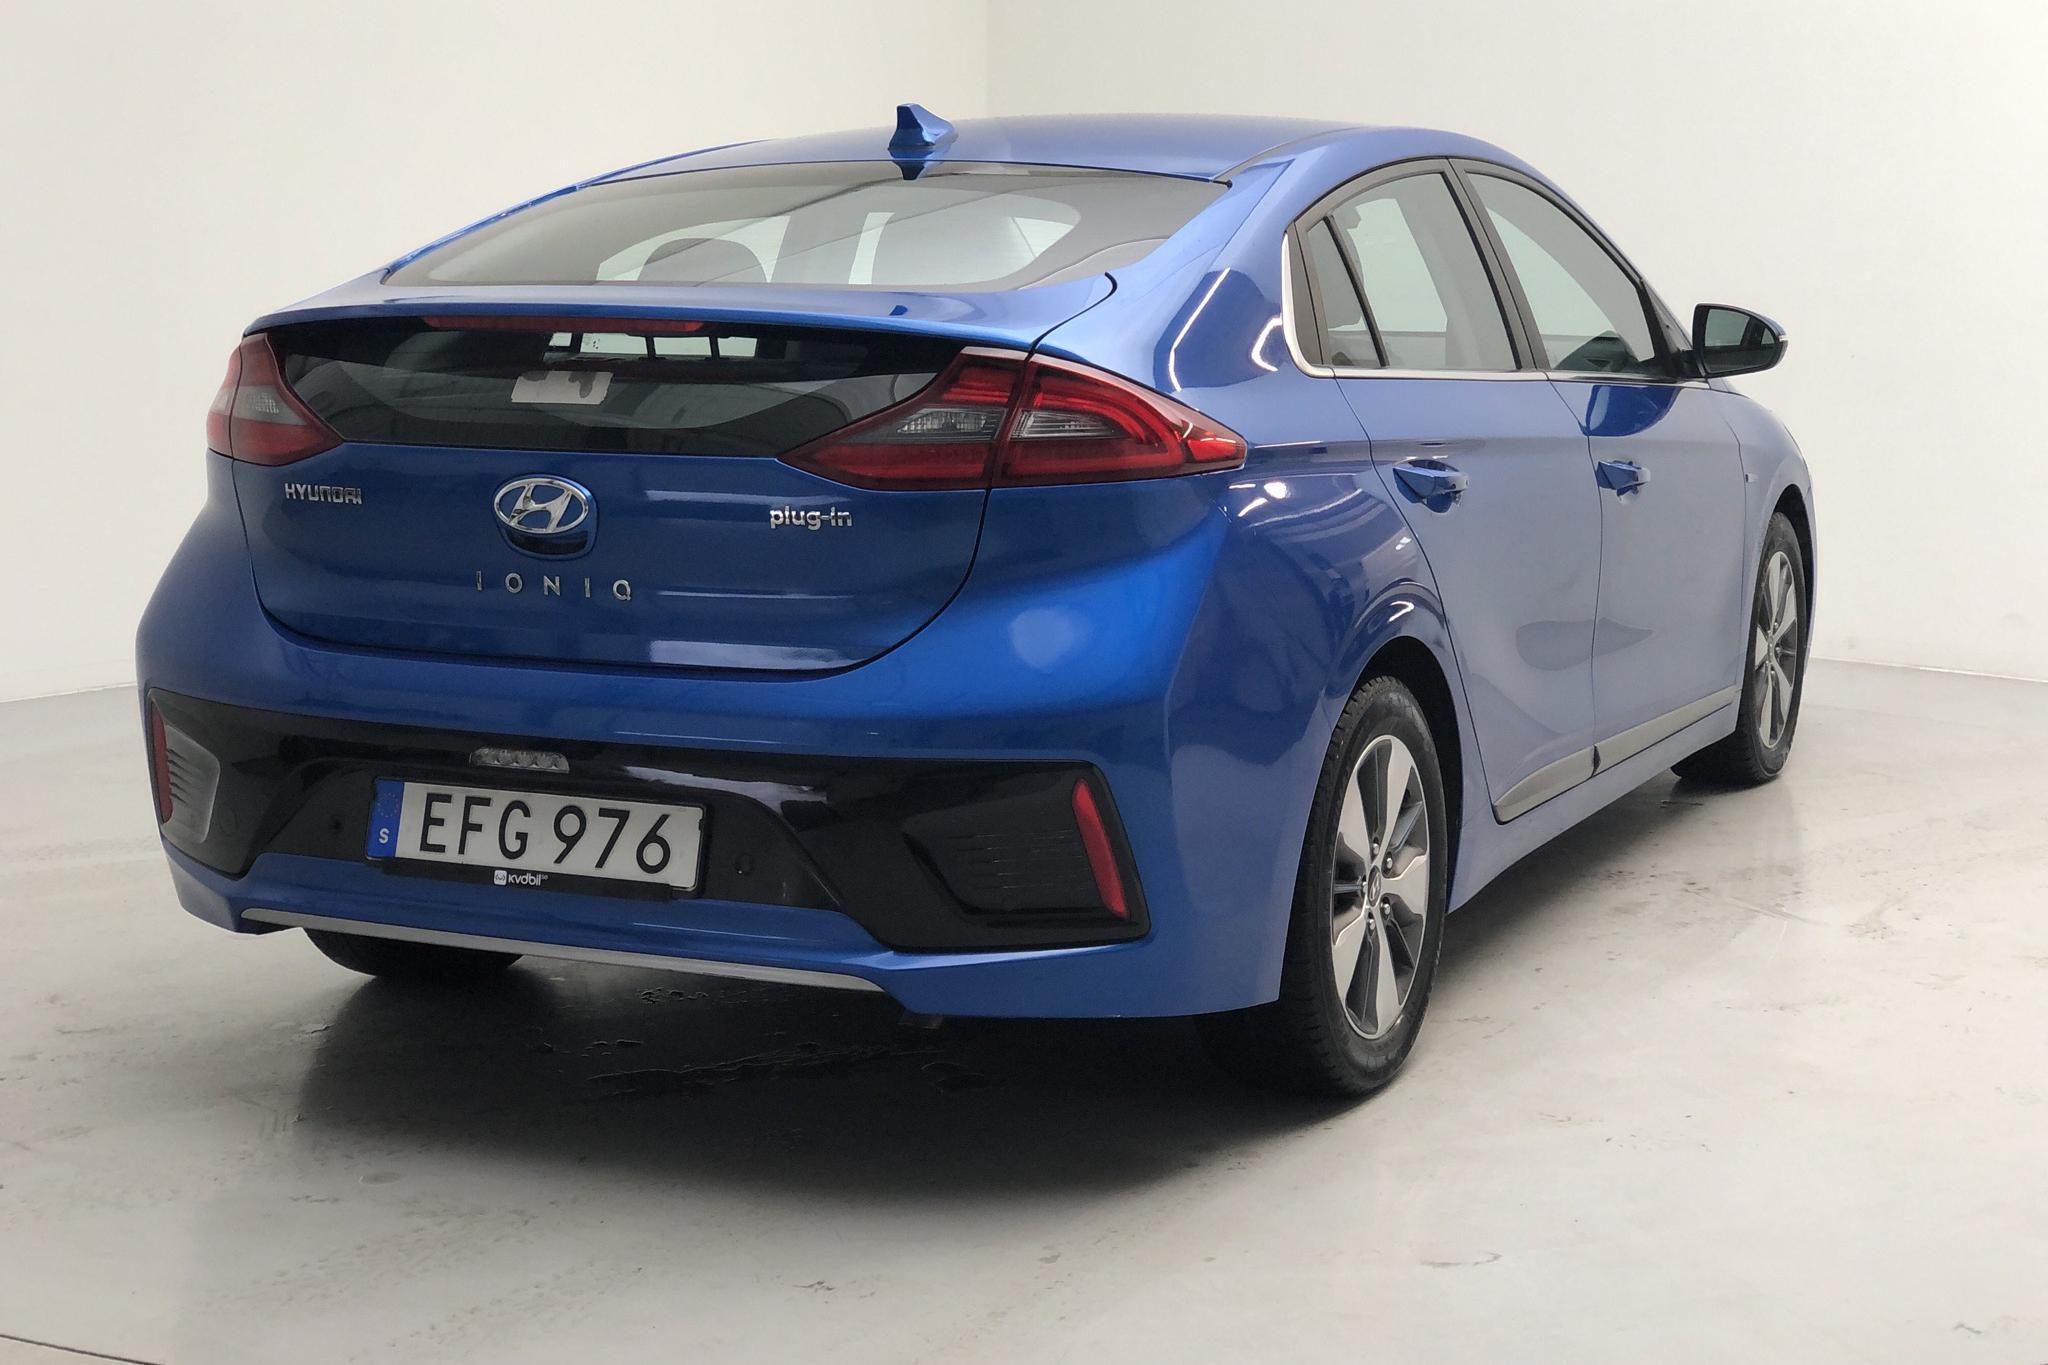 Hyundai IONIQ Plug-in (141hk) - 80 610 km - Automatic - Dark Blue - 2017